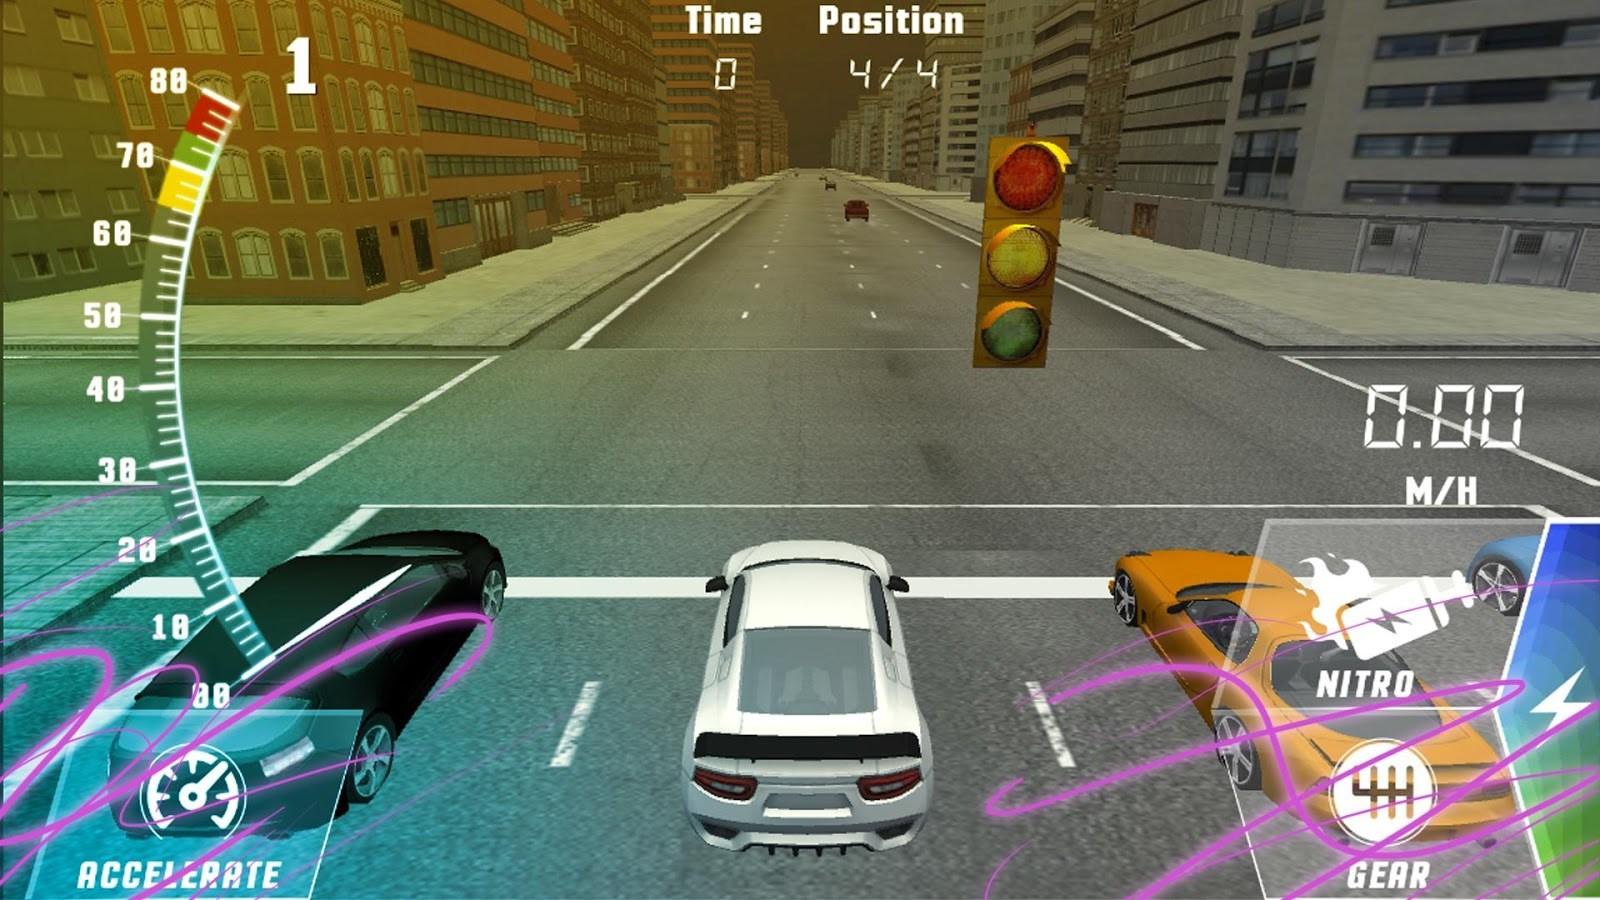 Drag Race : Top Speed Car 3D - Imagem 1 do software